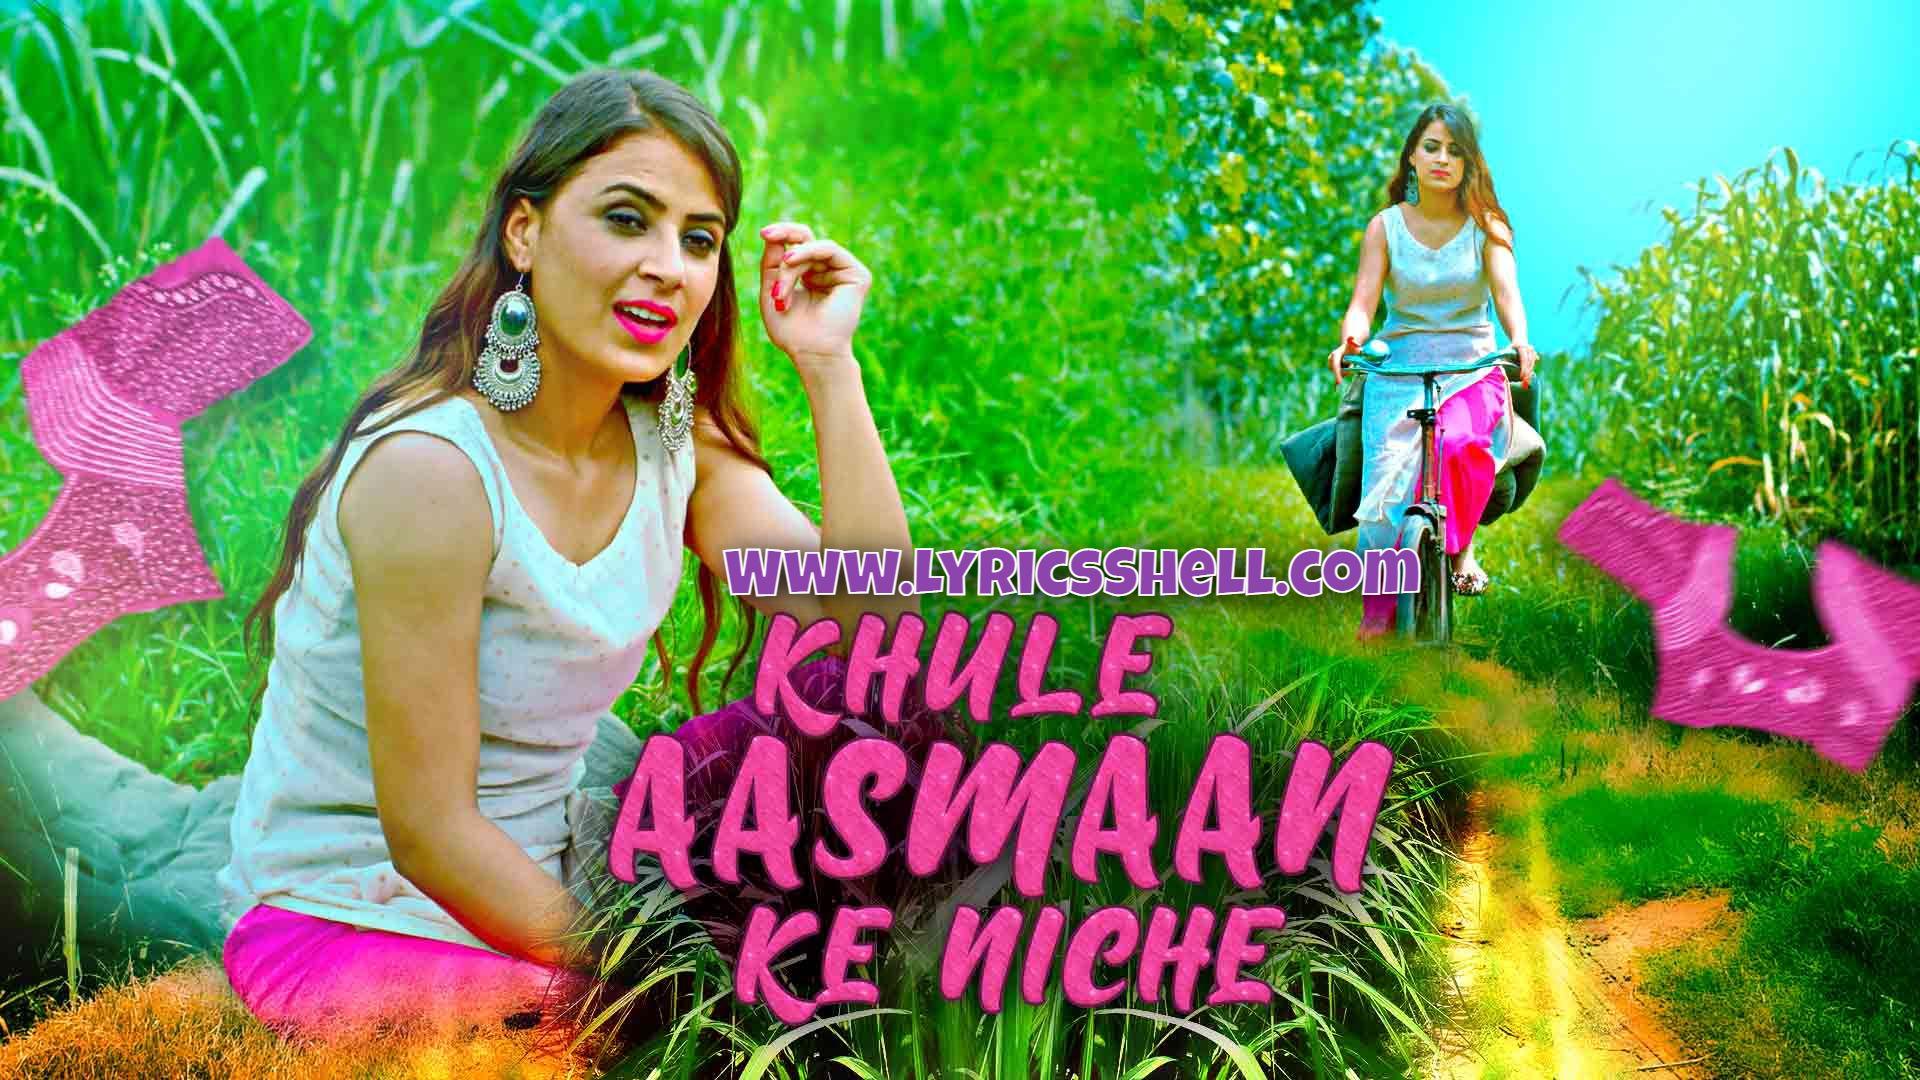 Khule Aasman Ke Niche (2021) Web Series Kooku Watch Online, Cast. All Episodes, Story